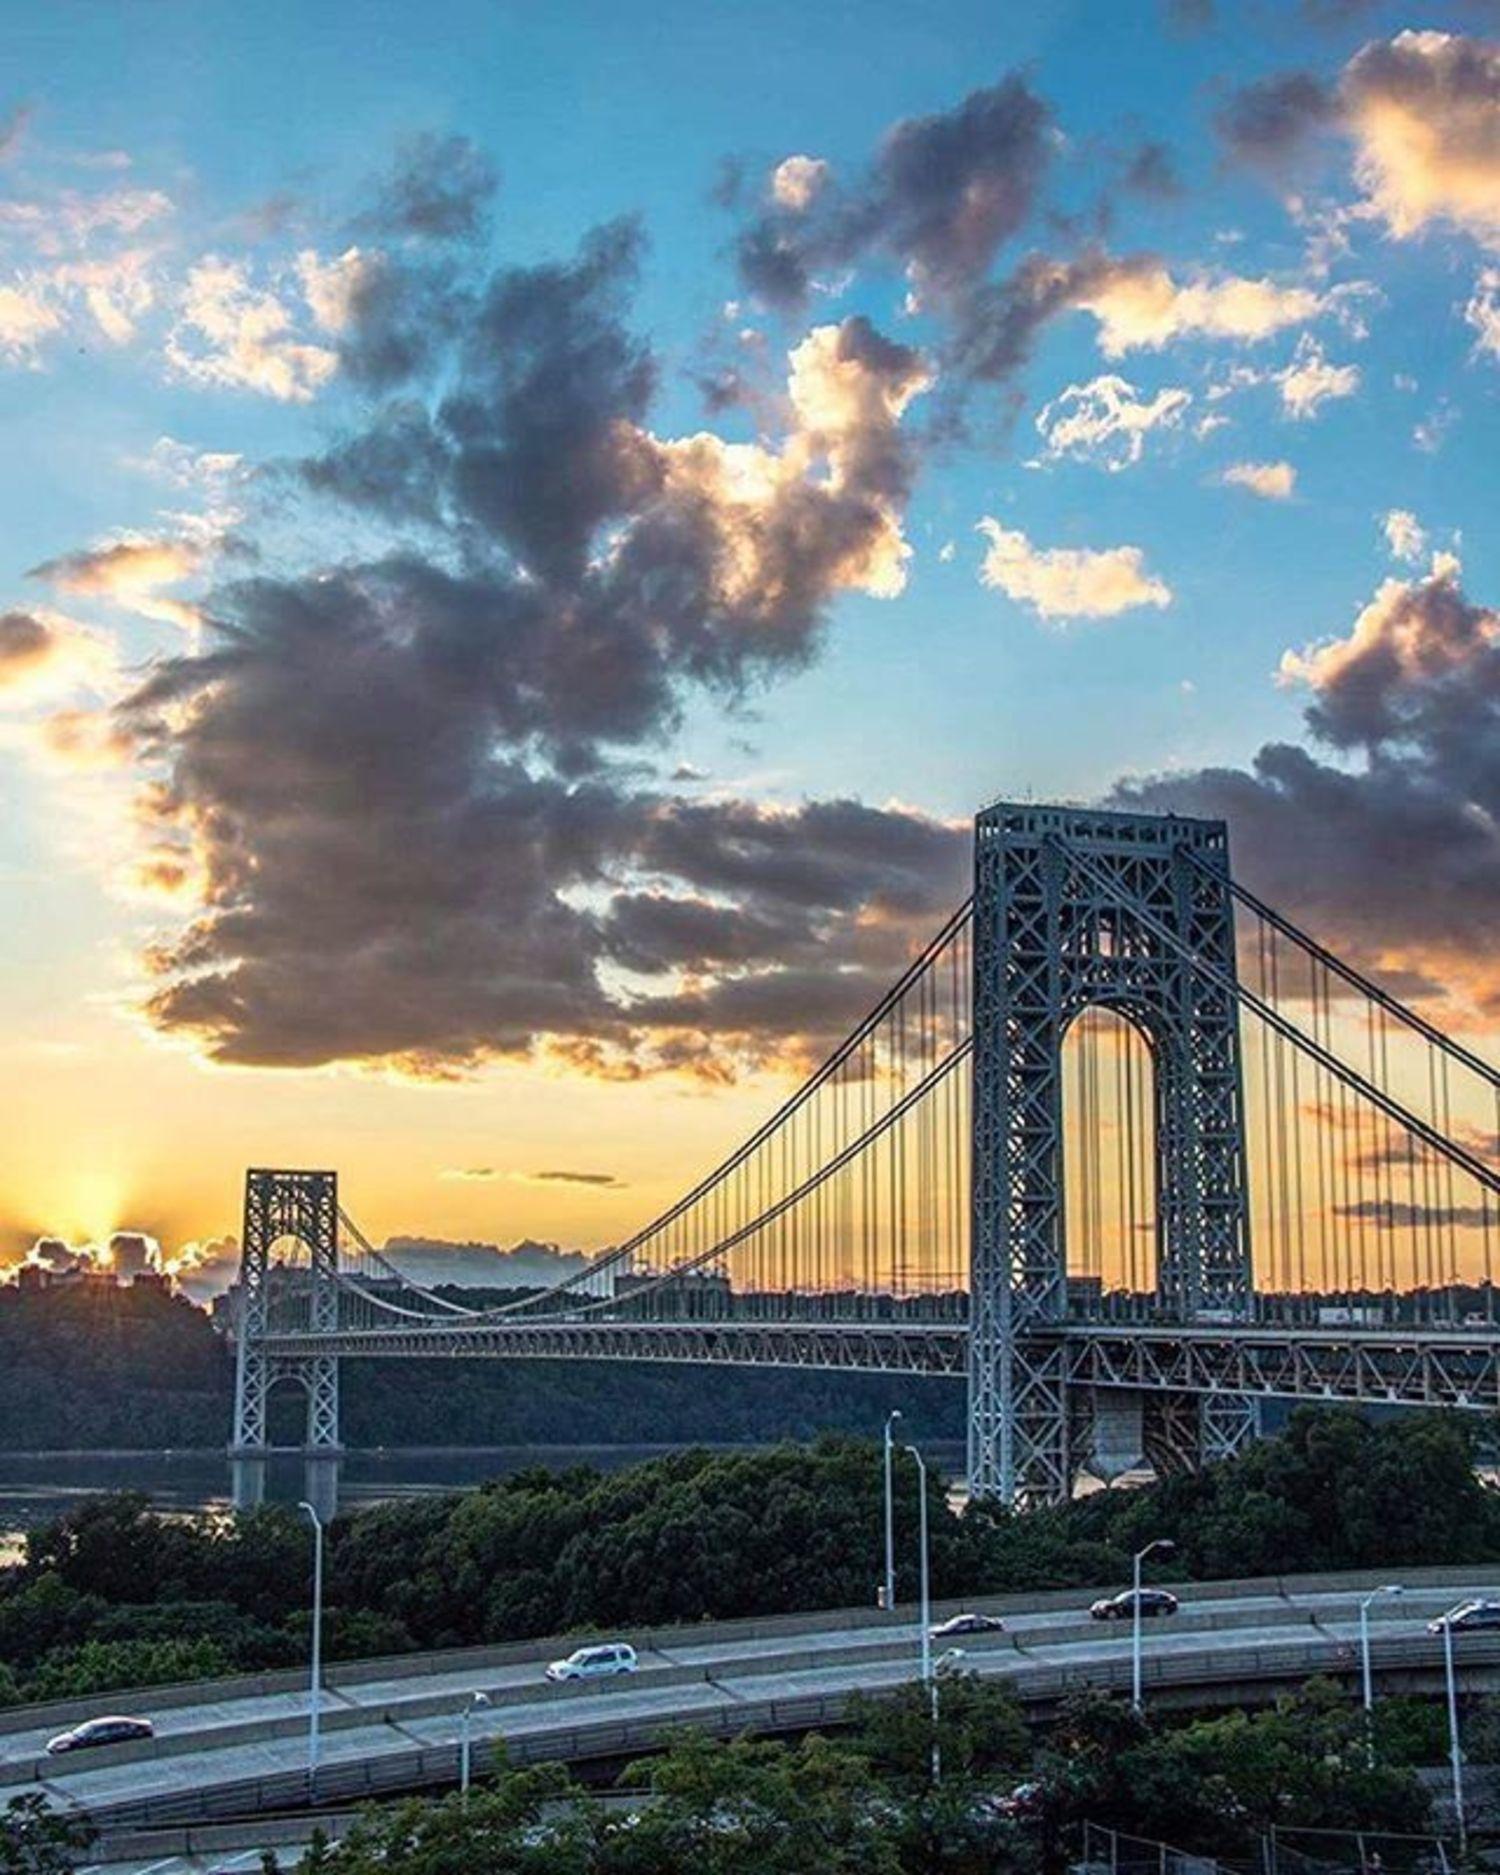 George Washington Bridge, New York. Photo via @newyorkcitykopp #viewingnyc #newyorkcity #newyork